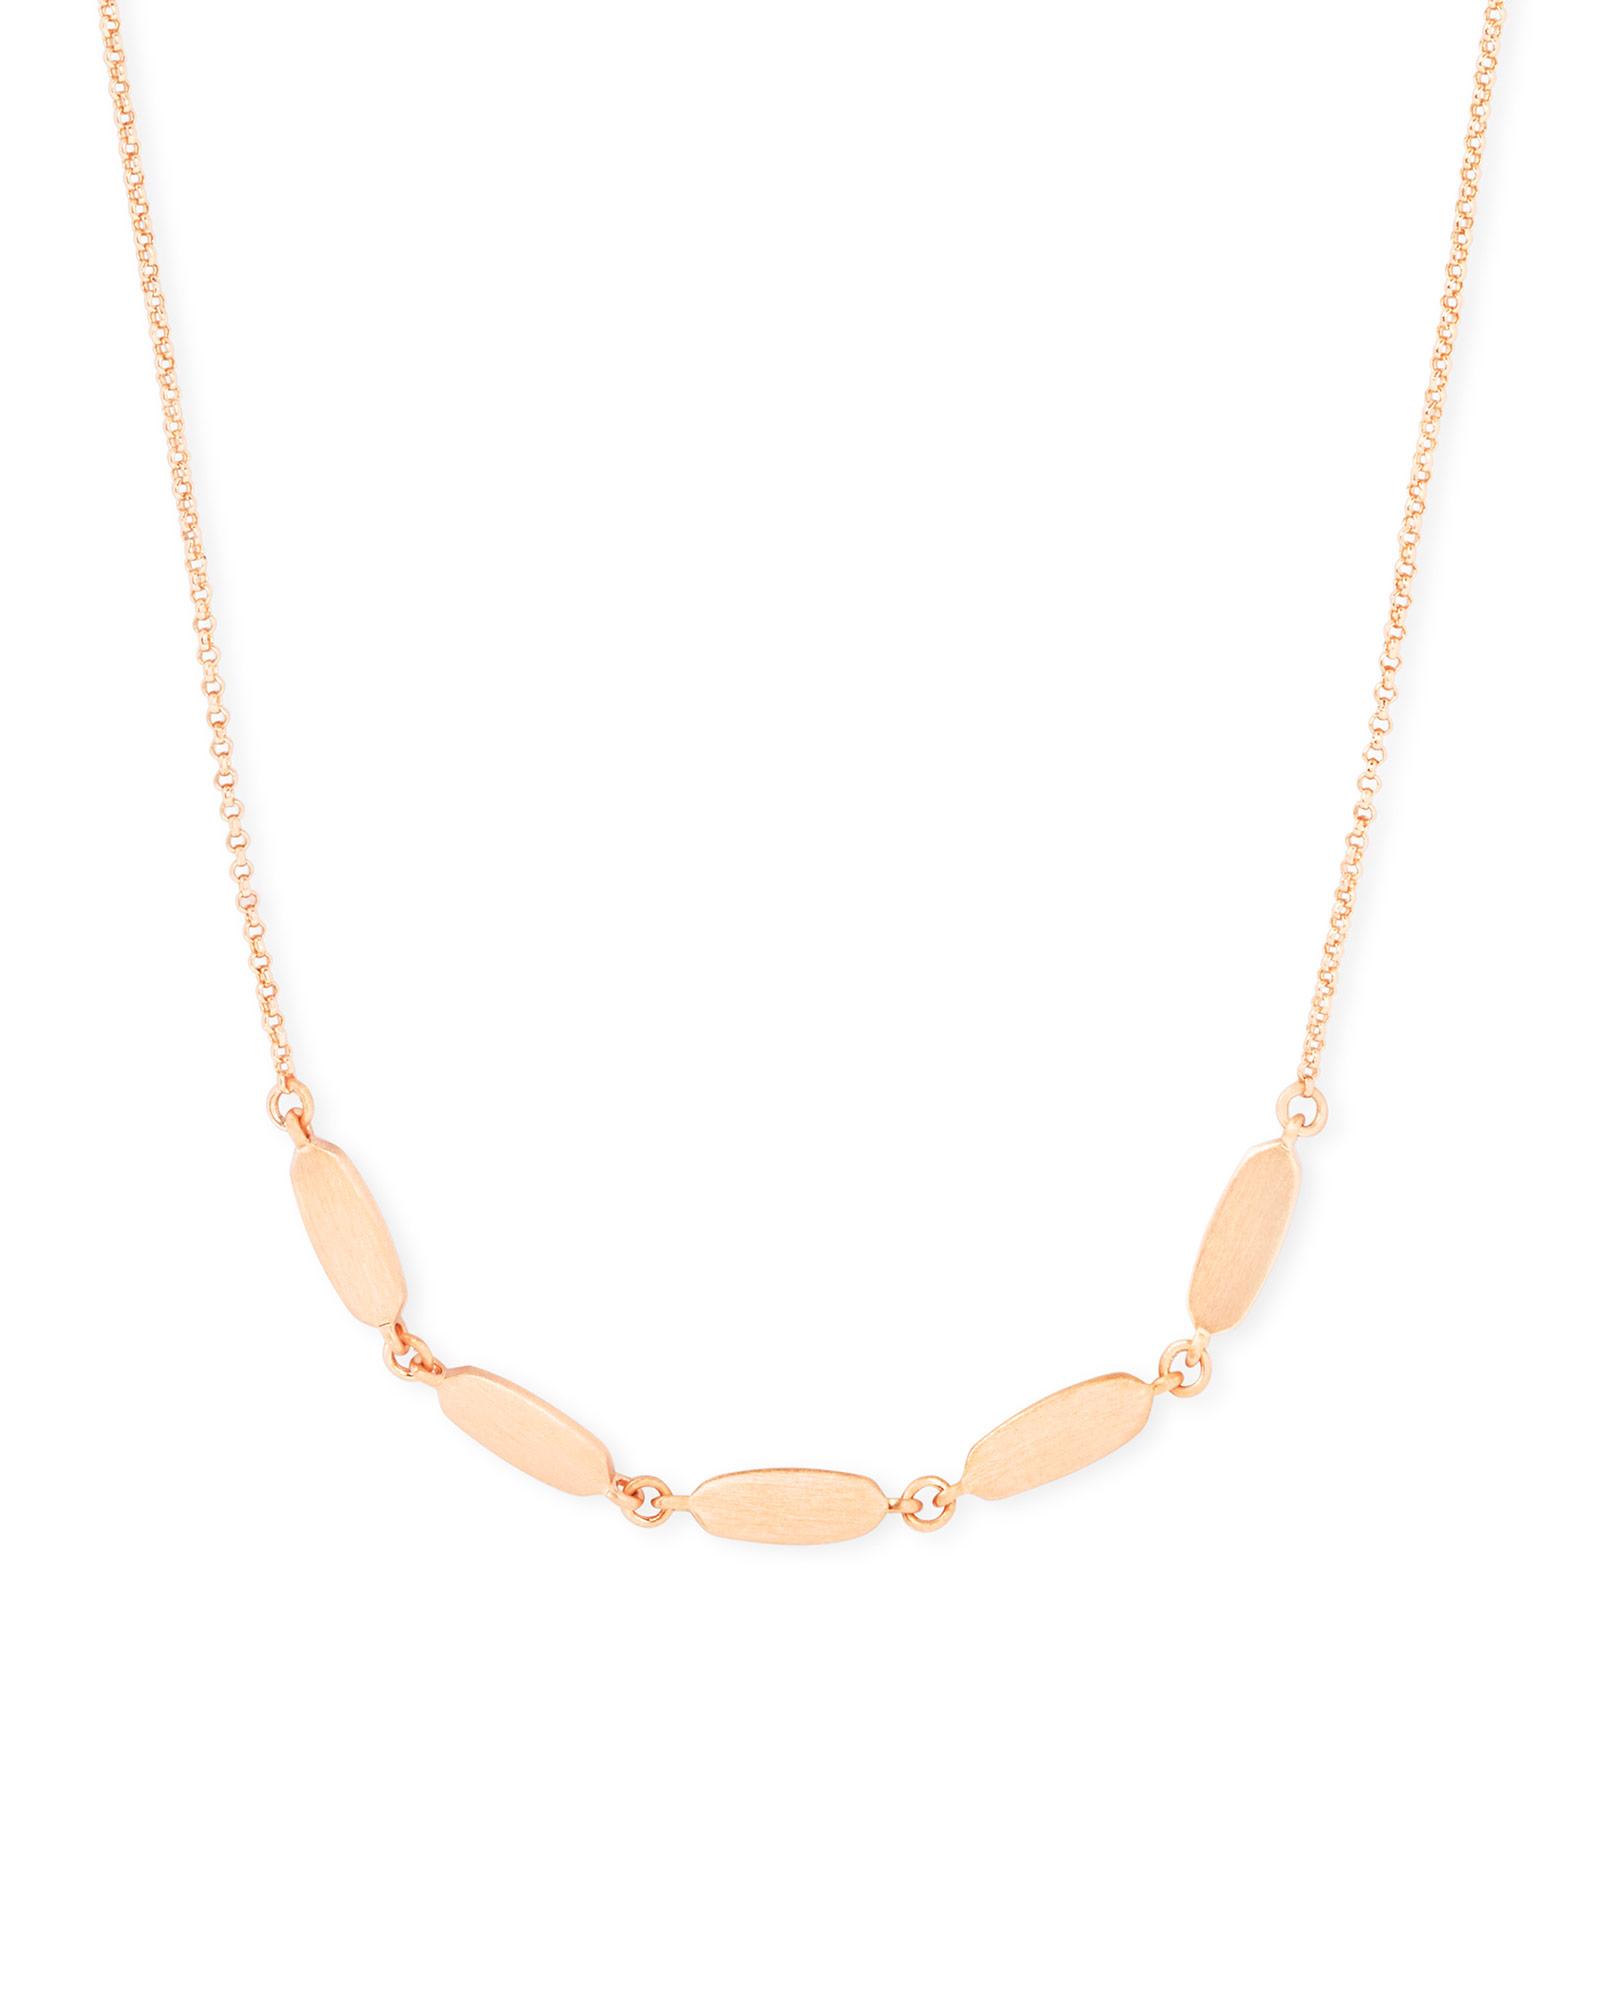 2c99bed38ff Necklaces | Pendants | Chokers | Bar Necklaces | Kendra Scott